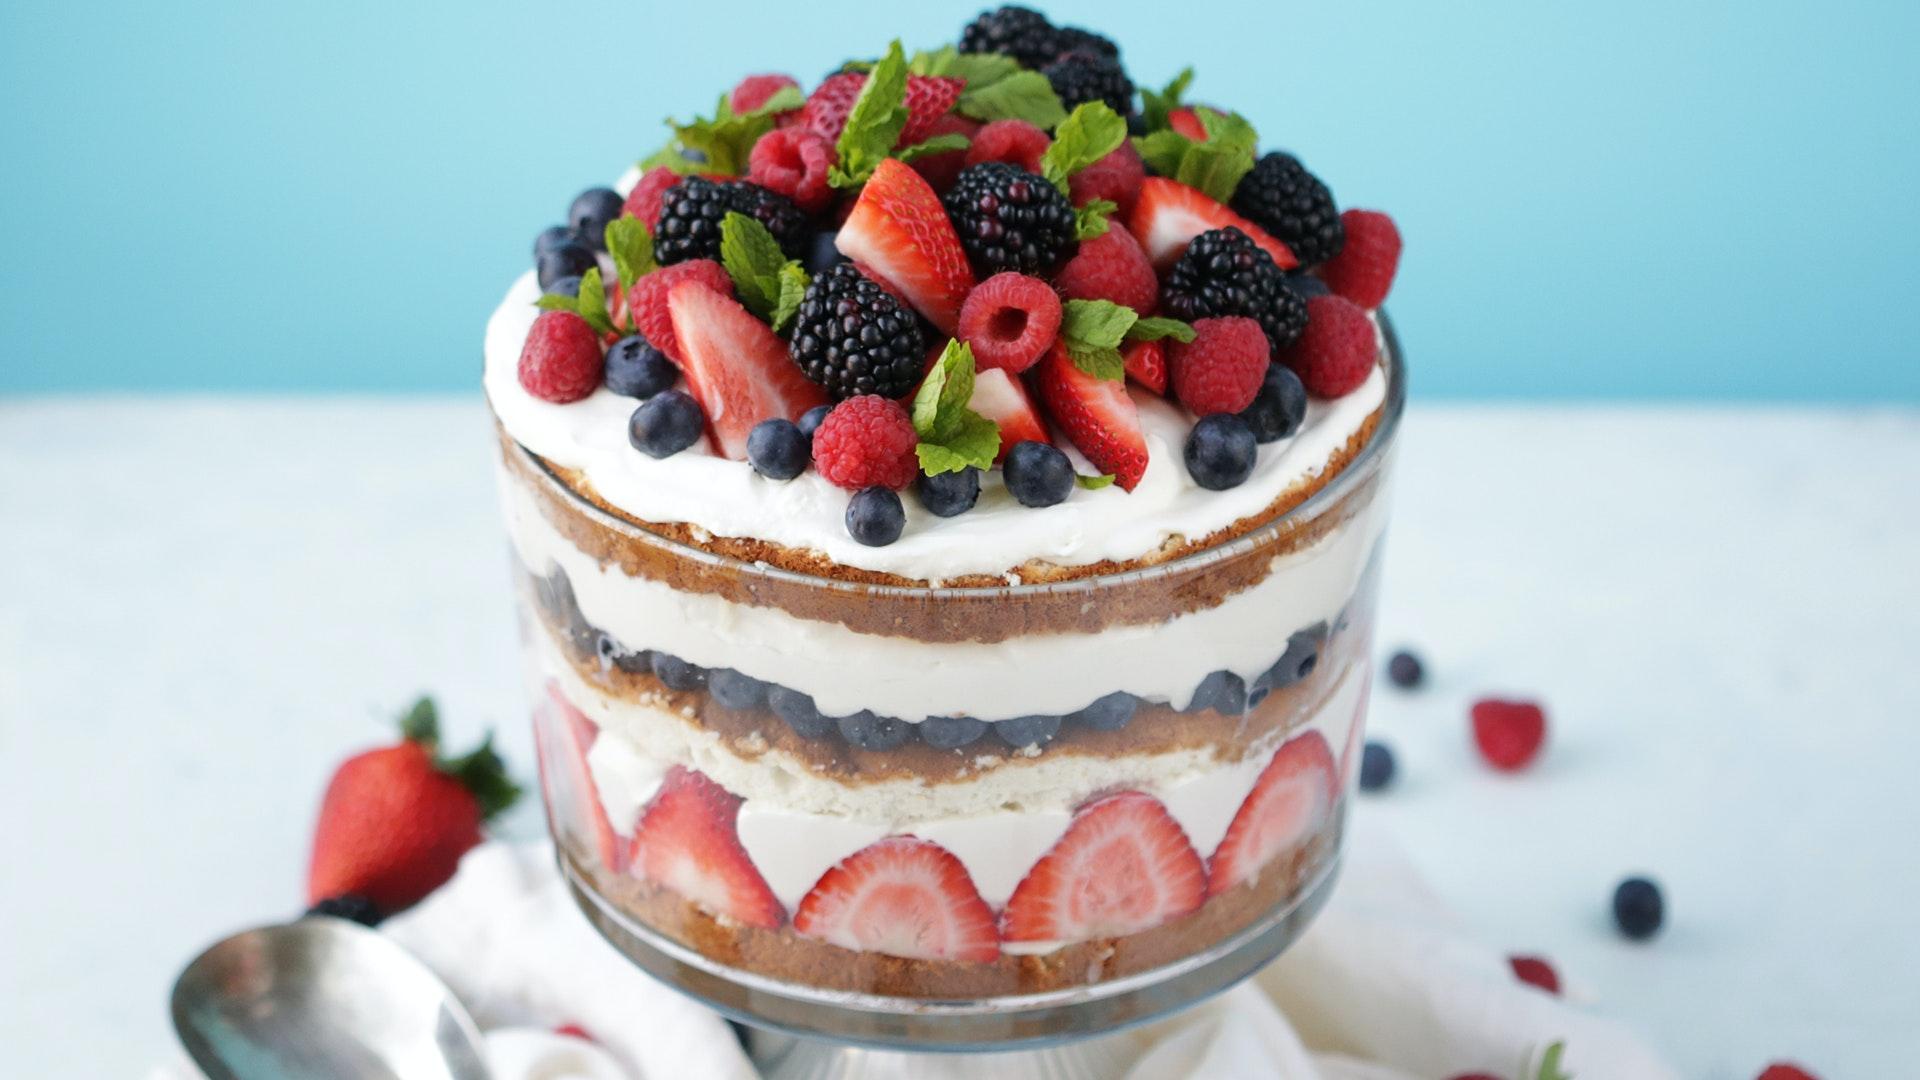 Homemade Angel Food Cake Trifle Recipe with Fresh Berries